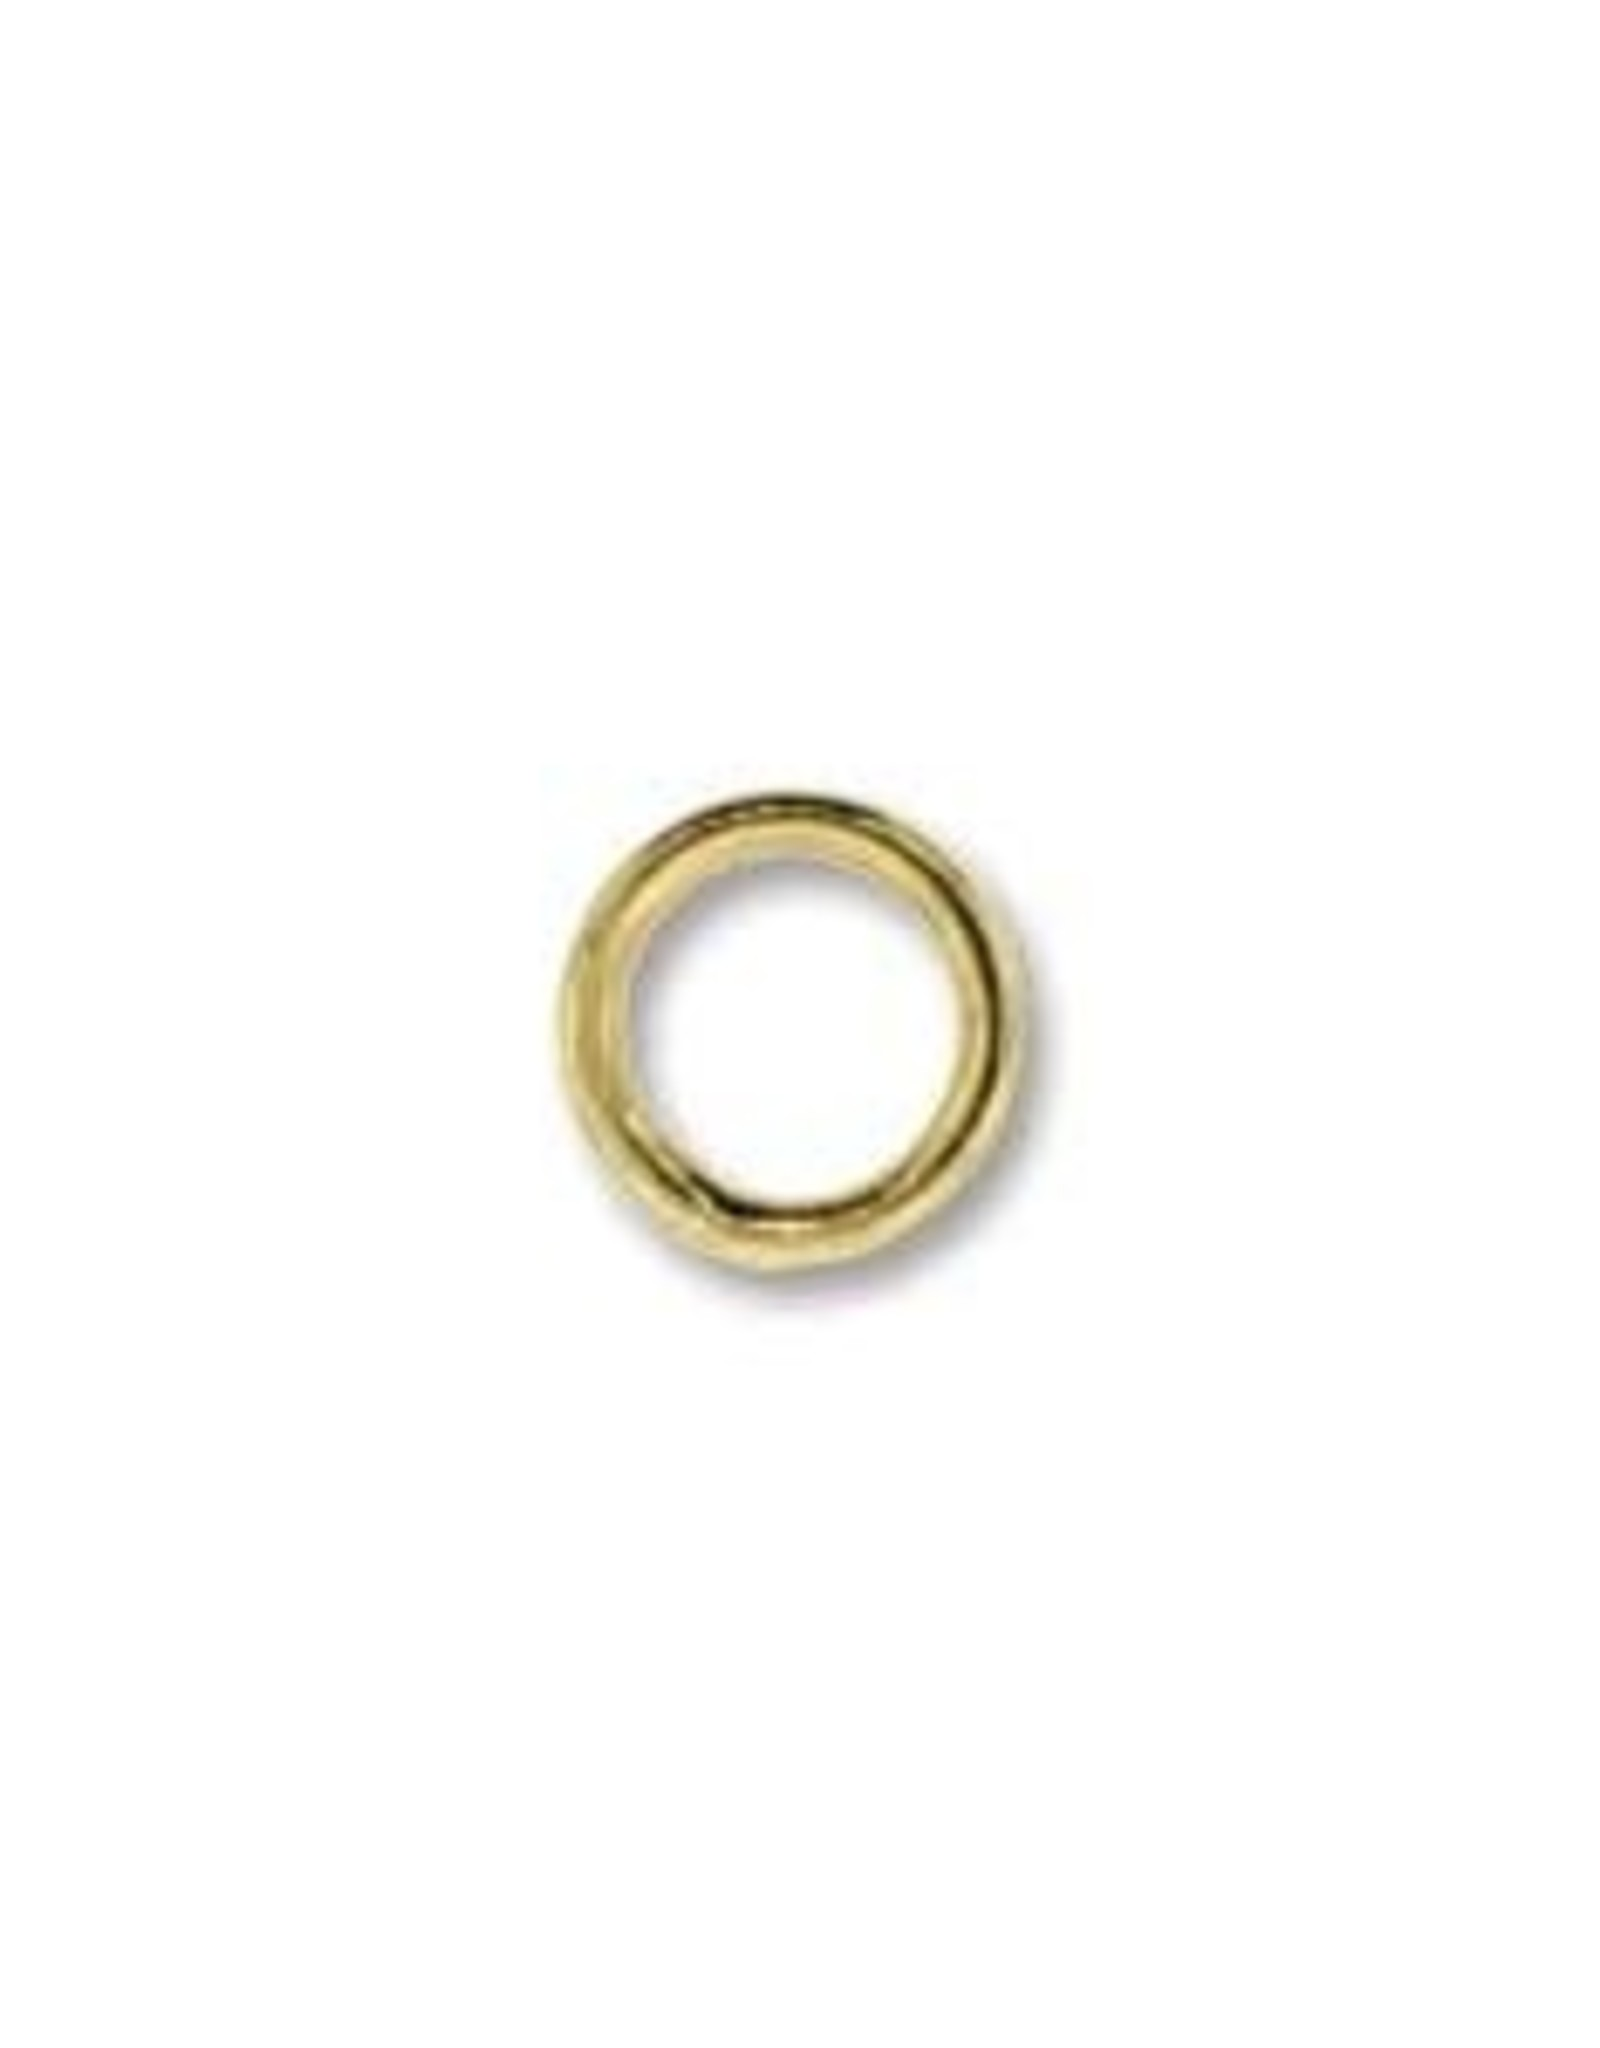 6mm Closed Ring 19ga Gold Plate Qty 144